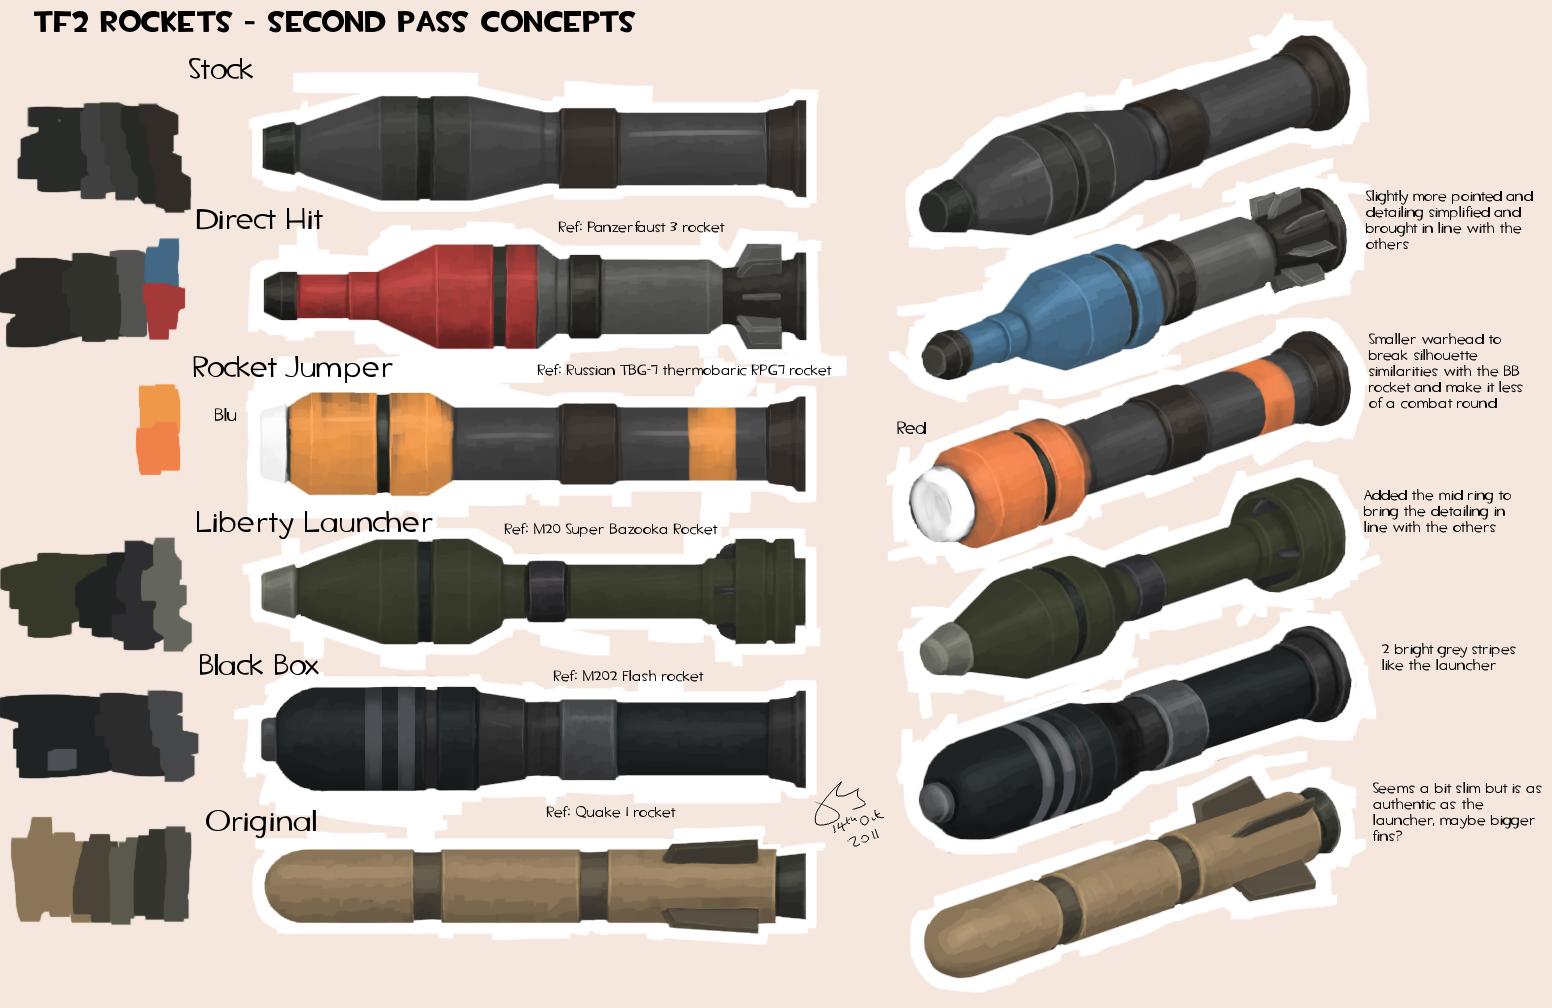 TF2 Rocket Concepts v2 by Elbagast